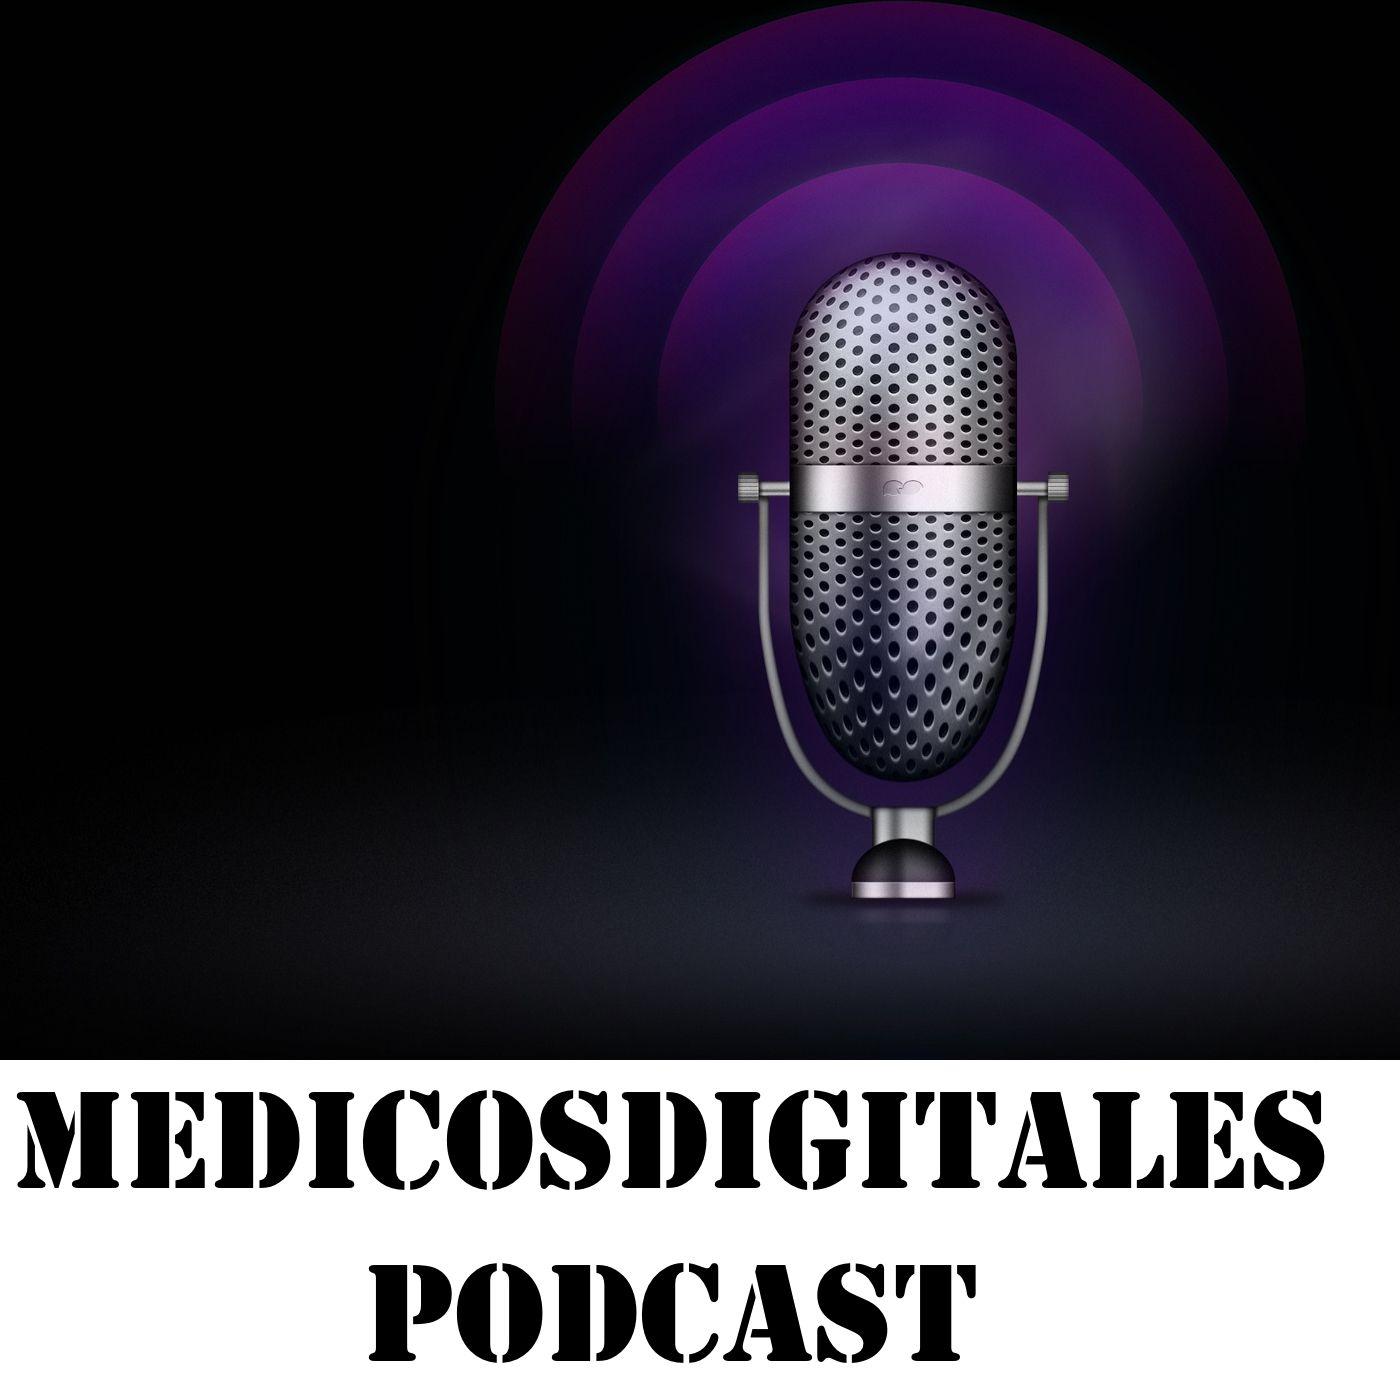 MedicosDigitales 2016